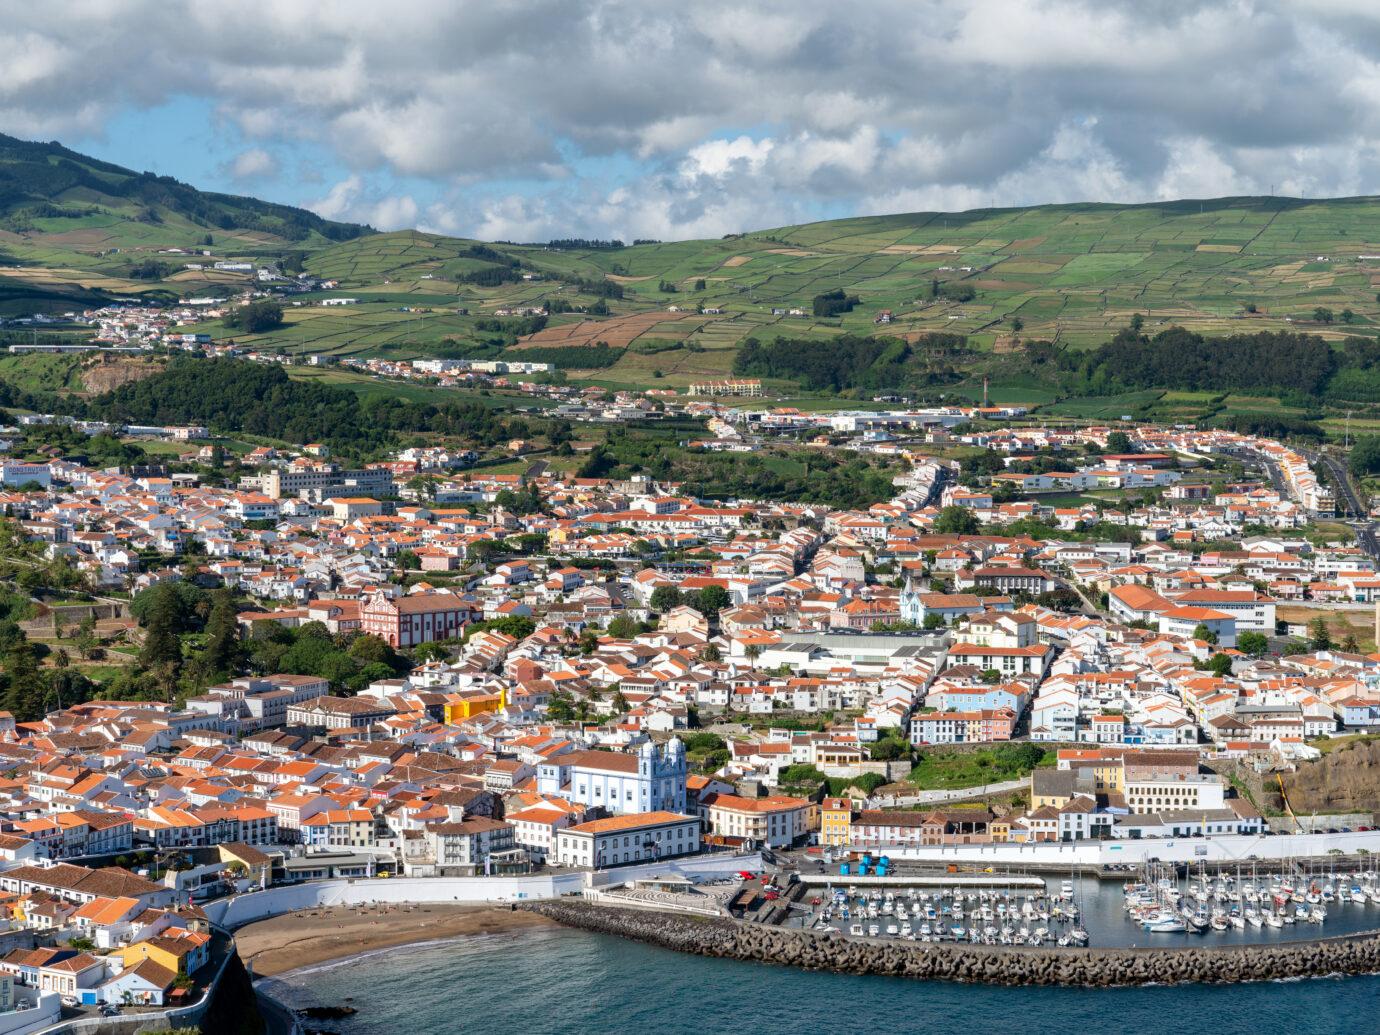 Town of Angra do Heroismo on Terciera Island, Azores